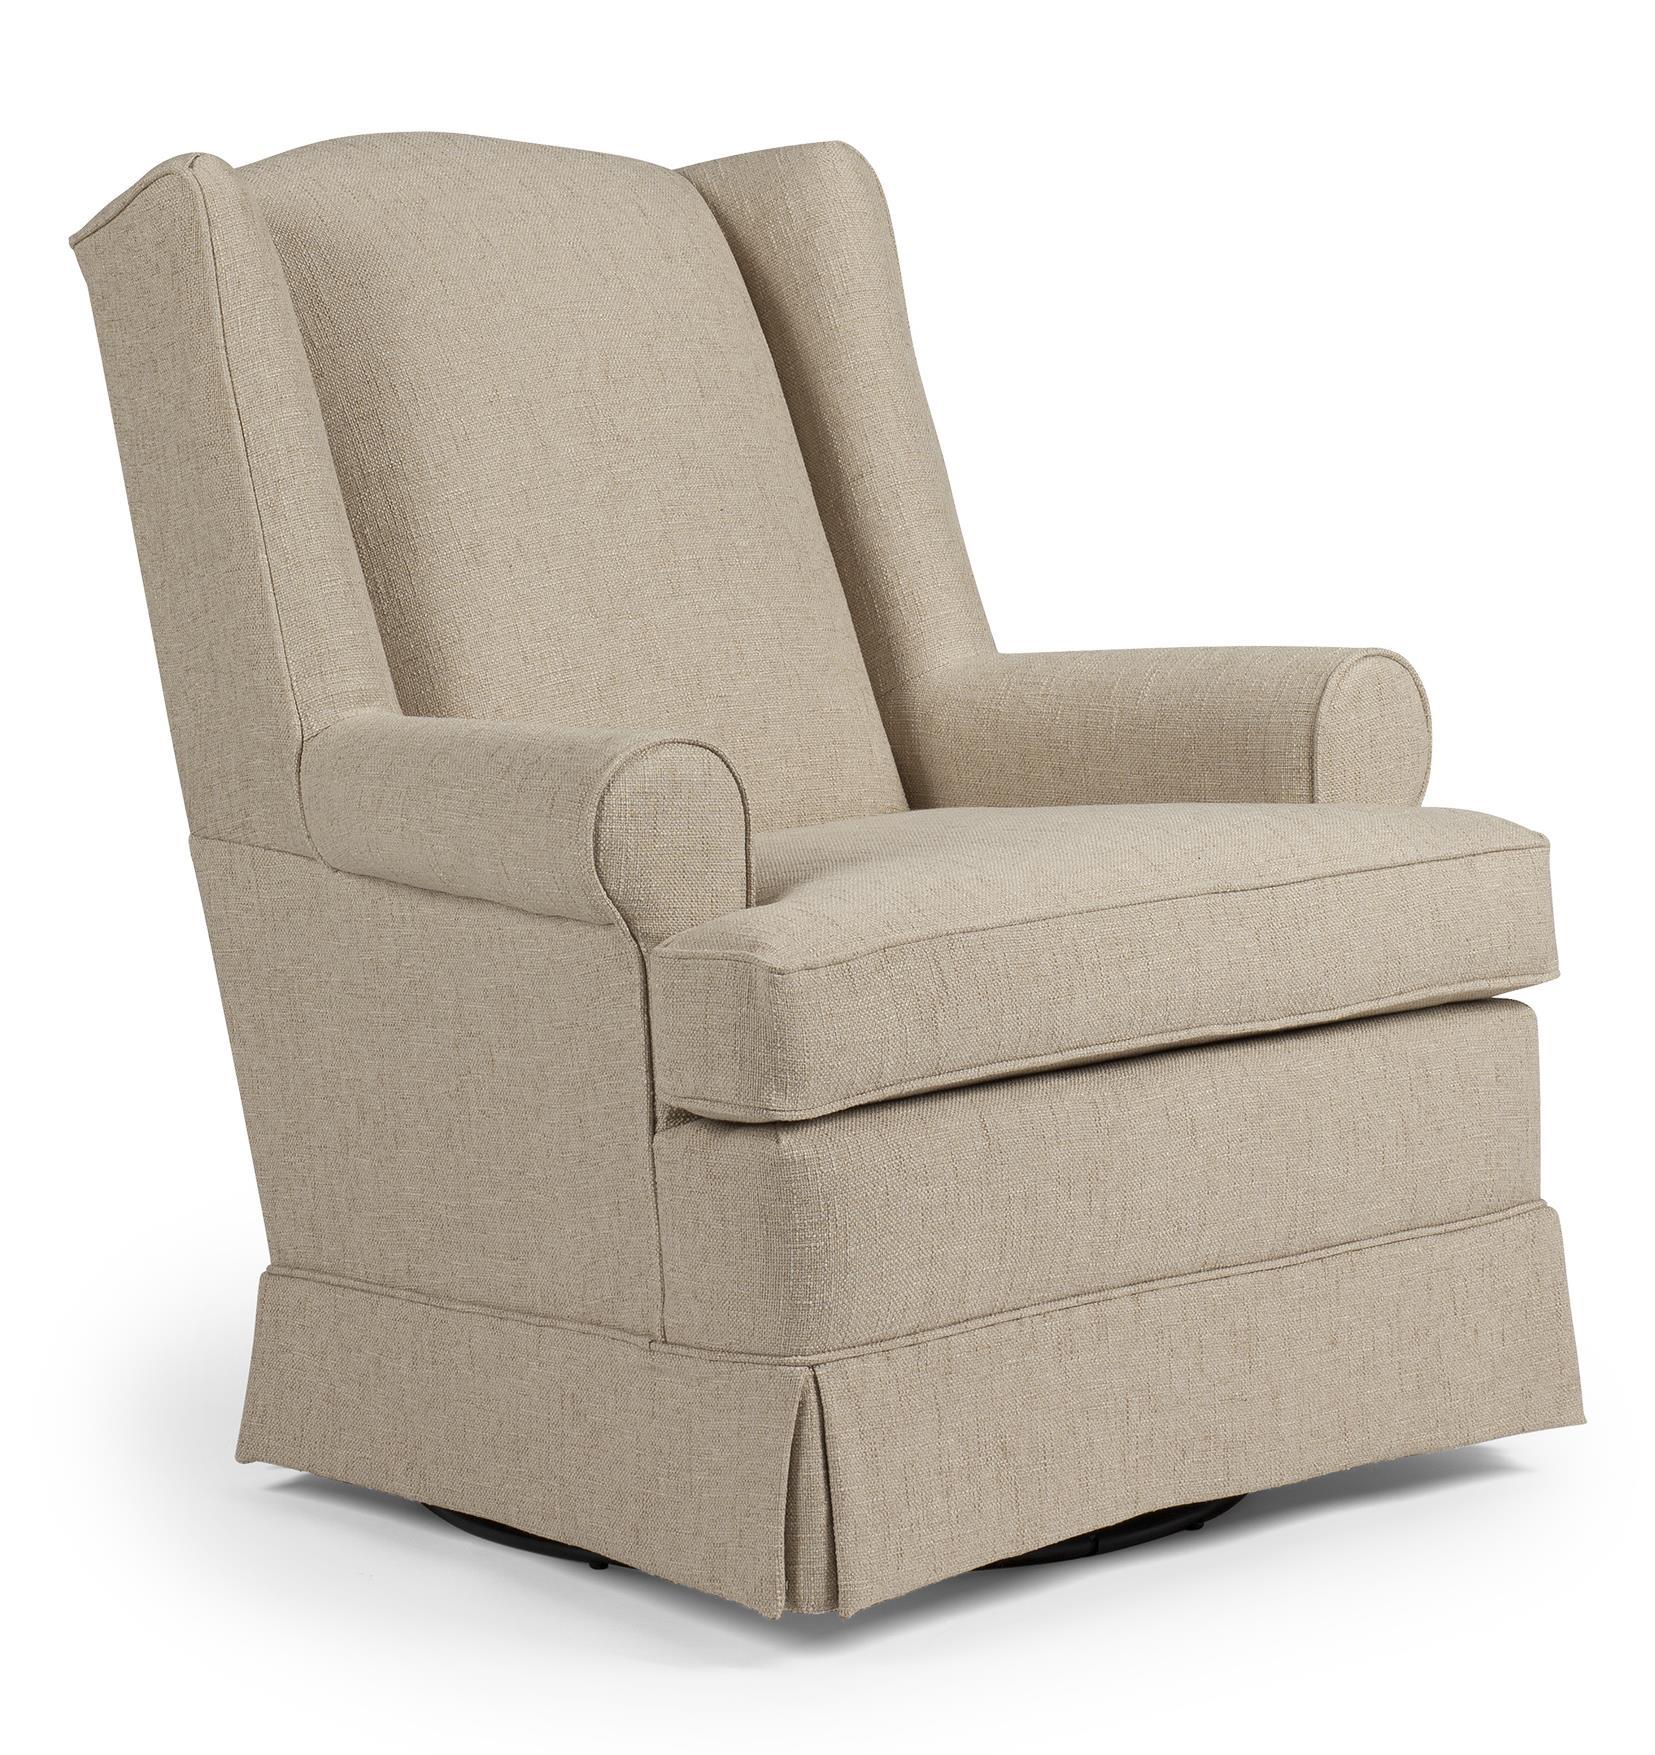 Best Home Furnishings Swivel Glide ChairsRoni Swivel Glider Chair ...